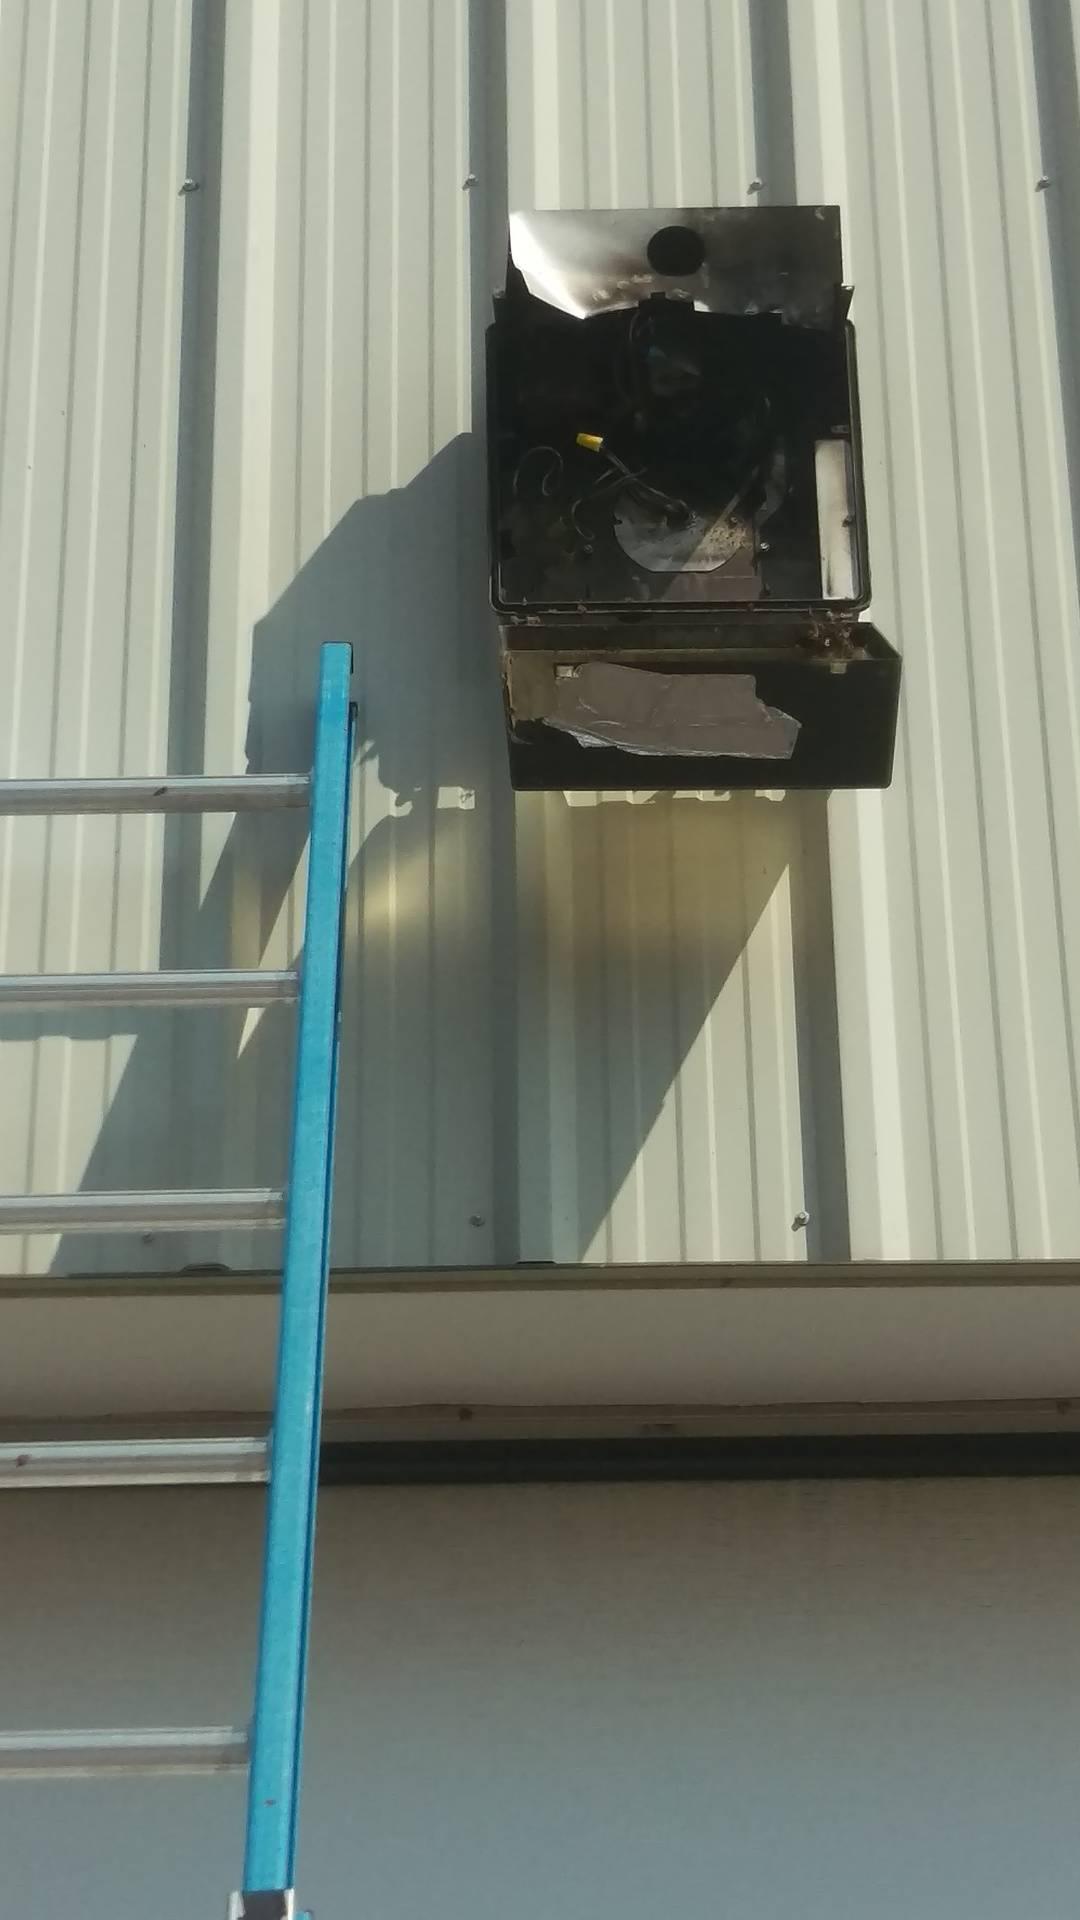 Breaker tripping for exterior lights!